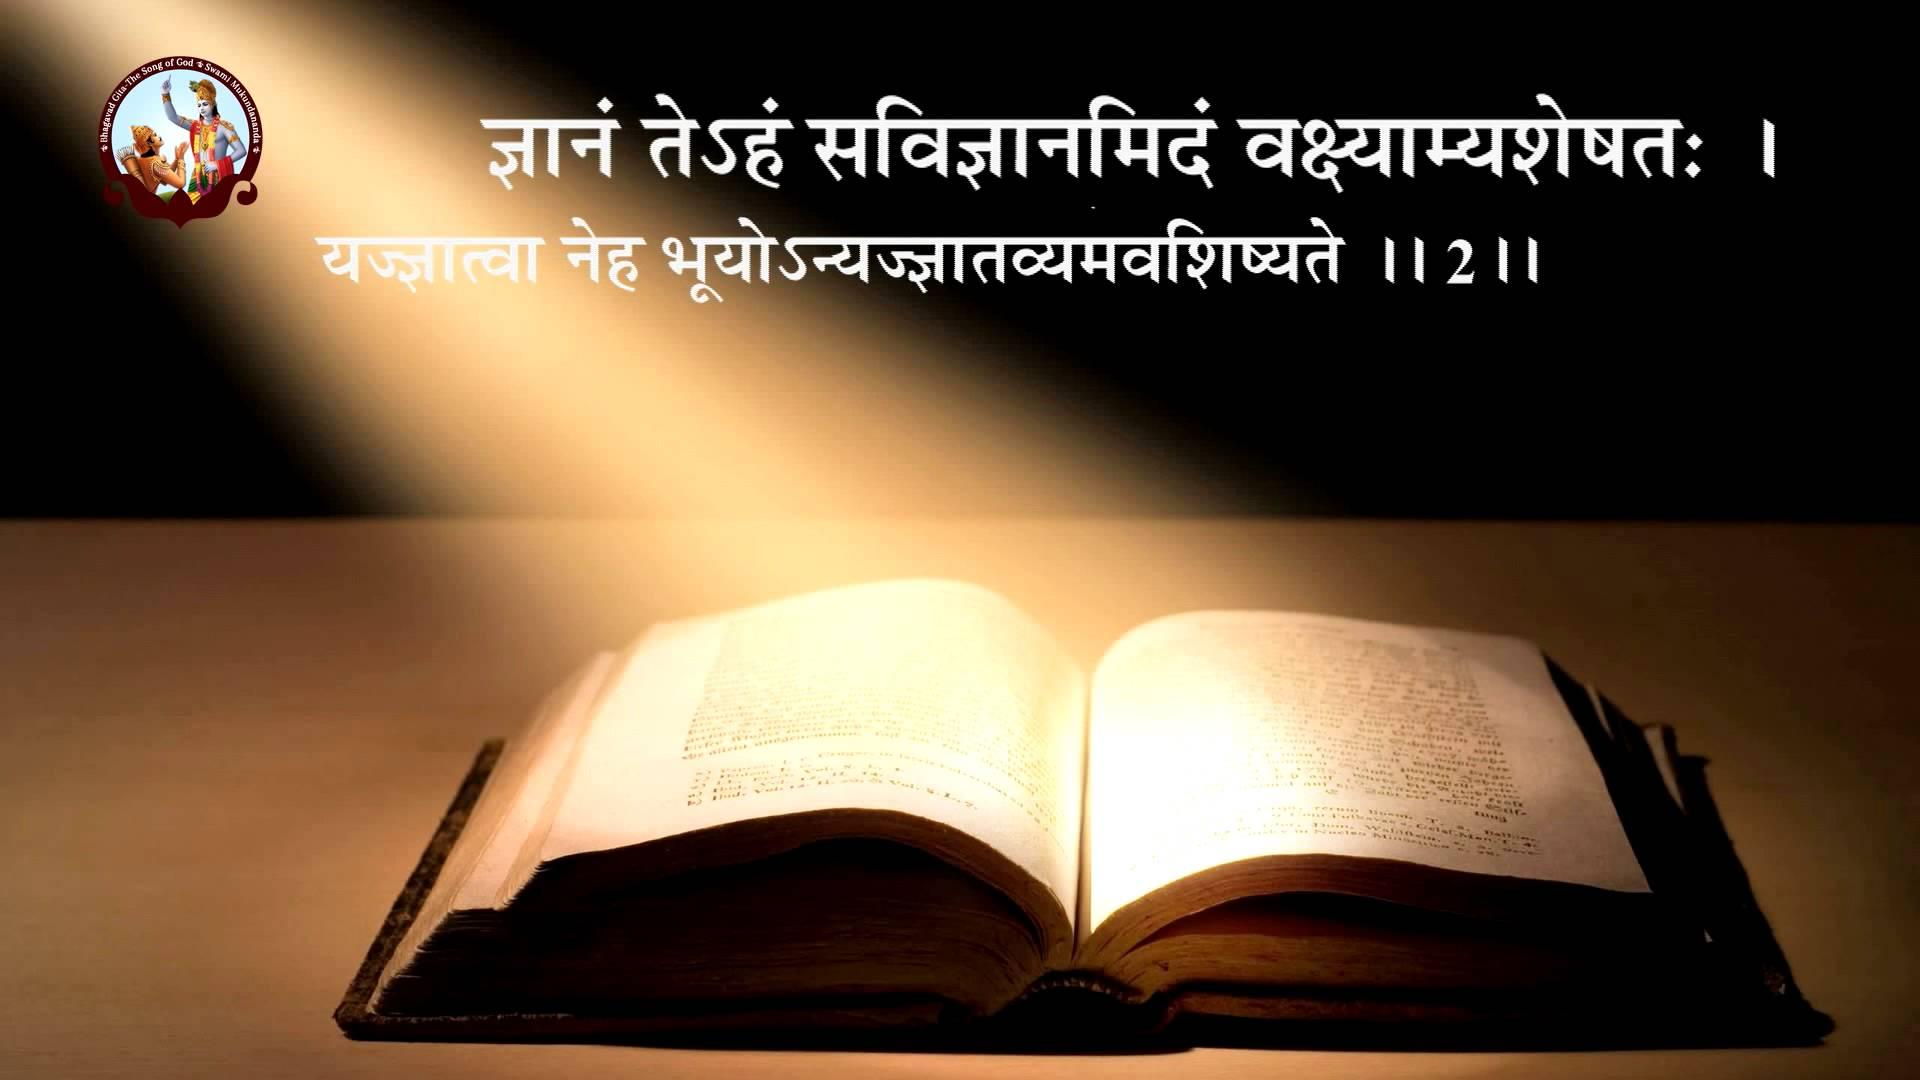 Gita Jayanti Special Mantra The Bhagavad Gita Image